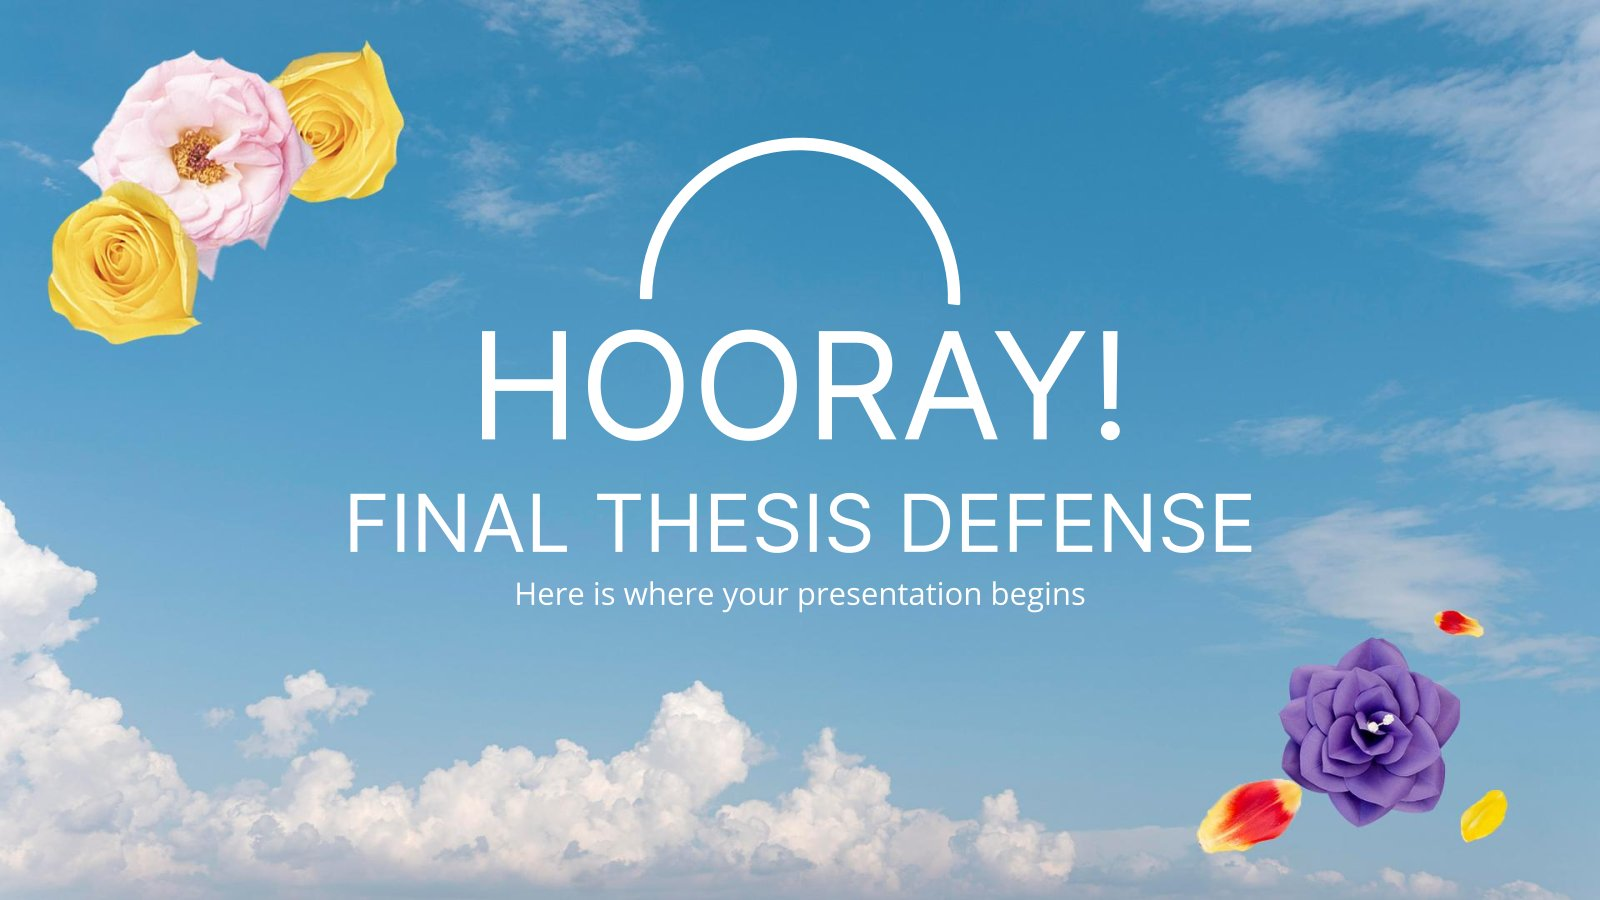 Plantilla de presentación ¡HURRA! Defensa final de tesis